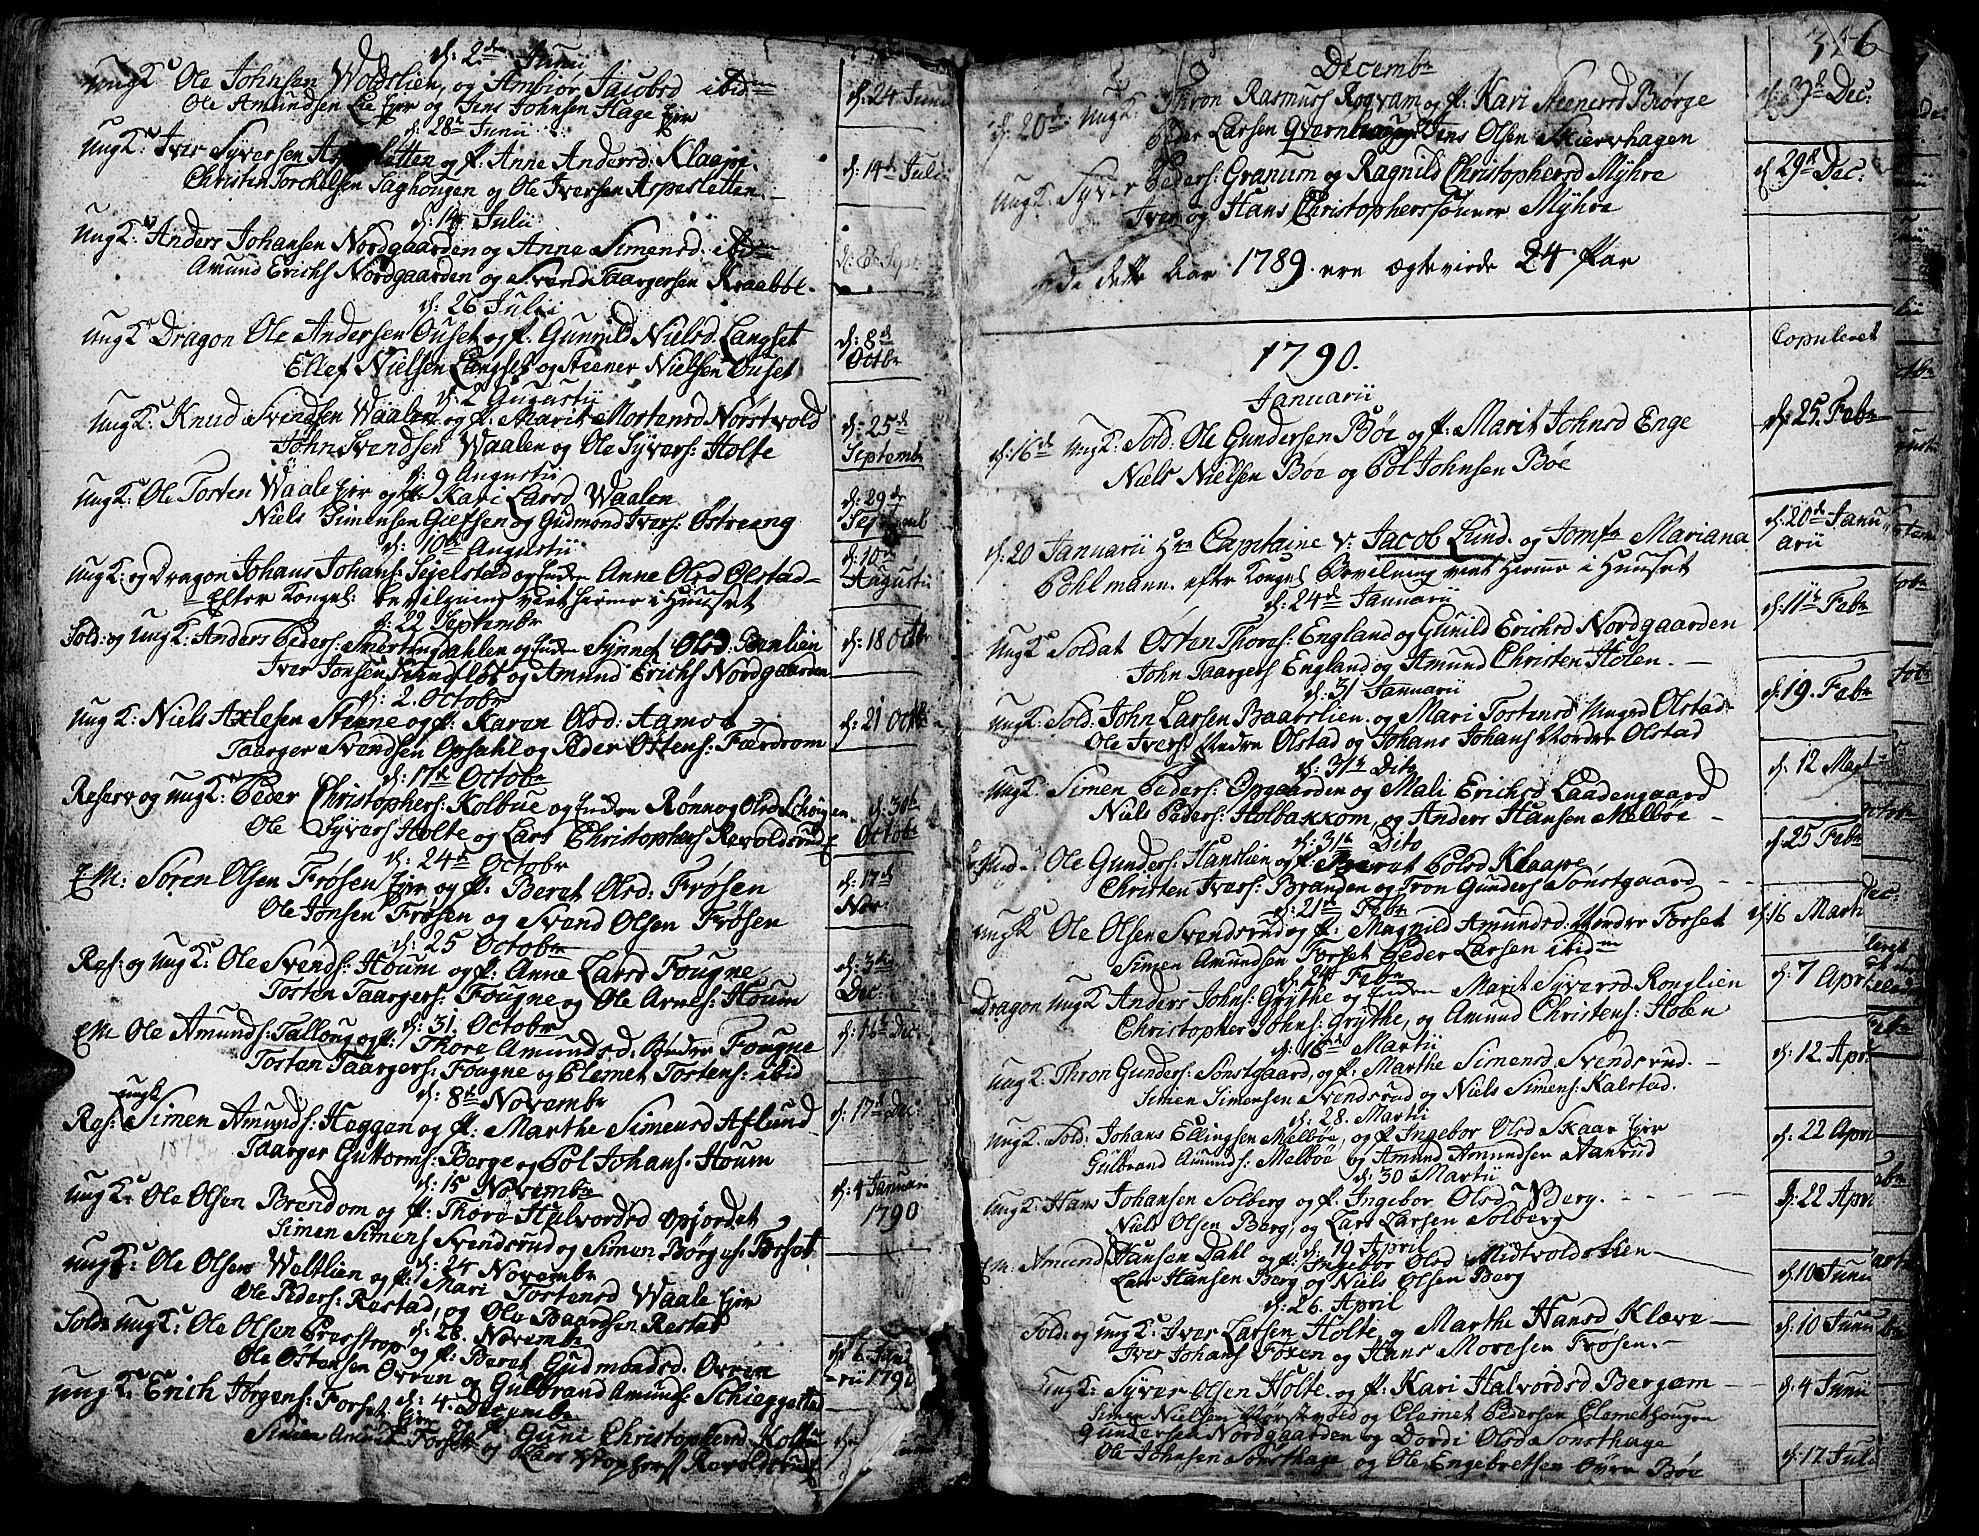 SAH, Gausdal prestekontor, Ministerialbok nr. 3, 1758-1809, s. 346